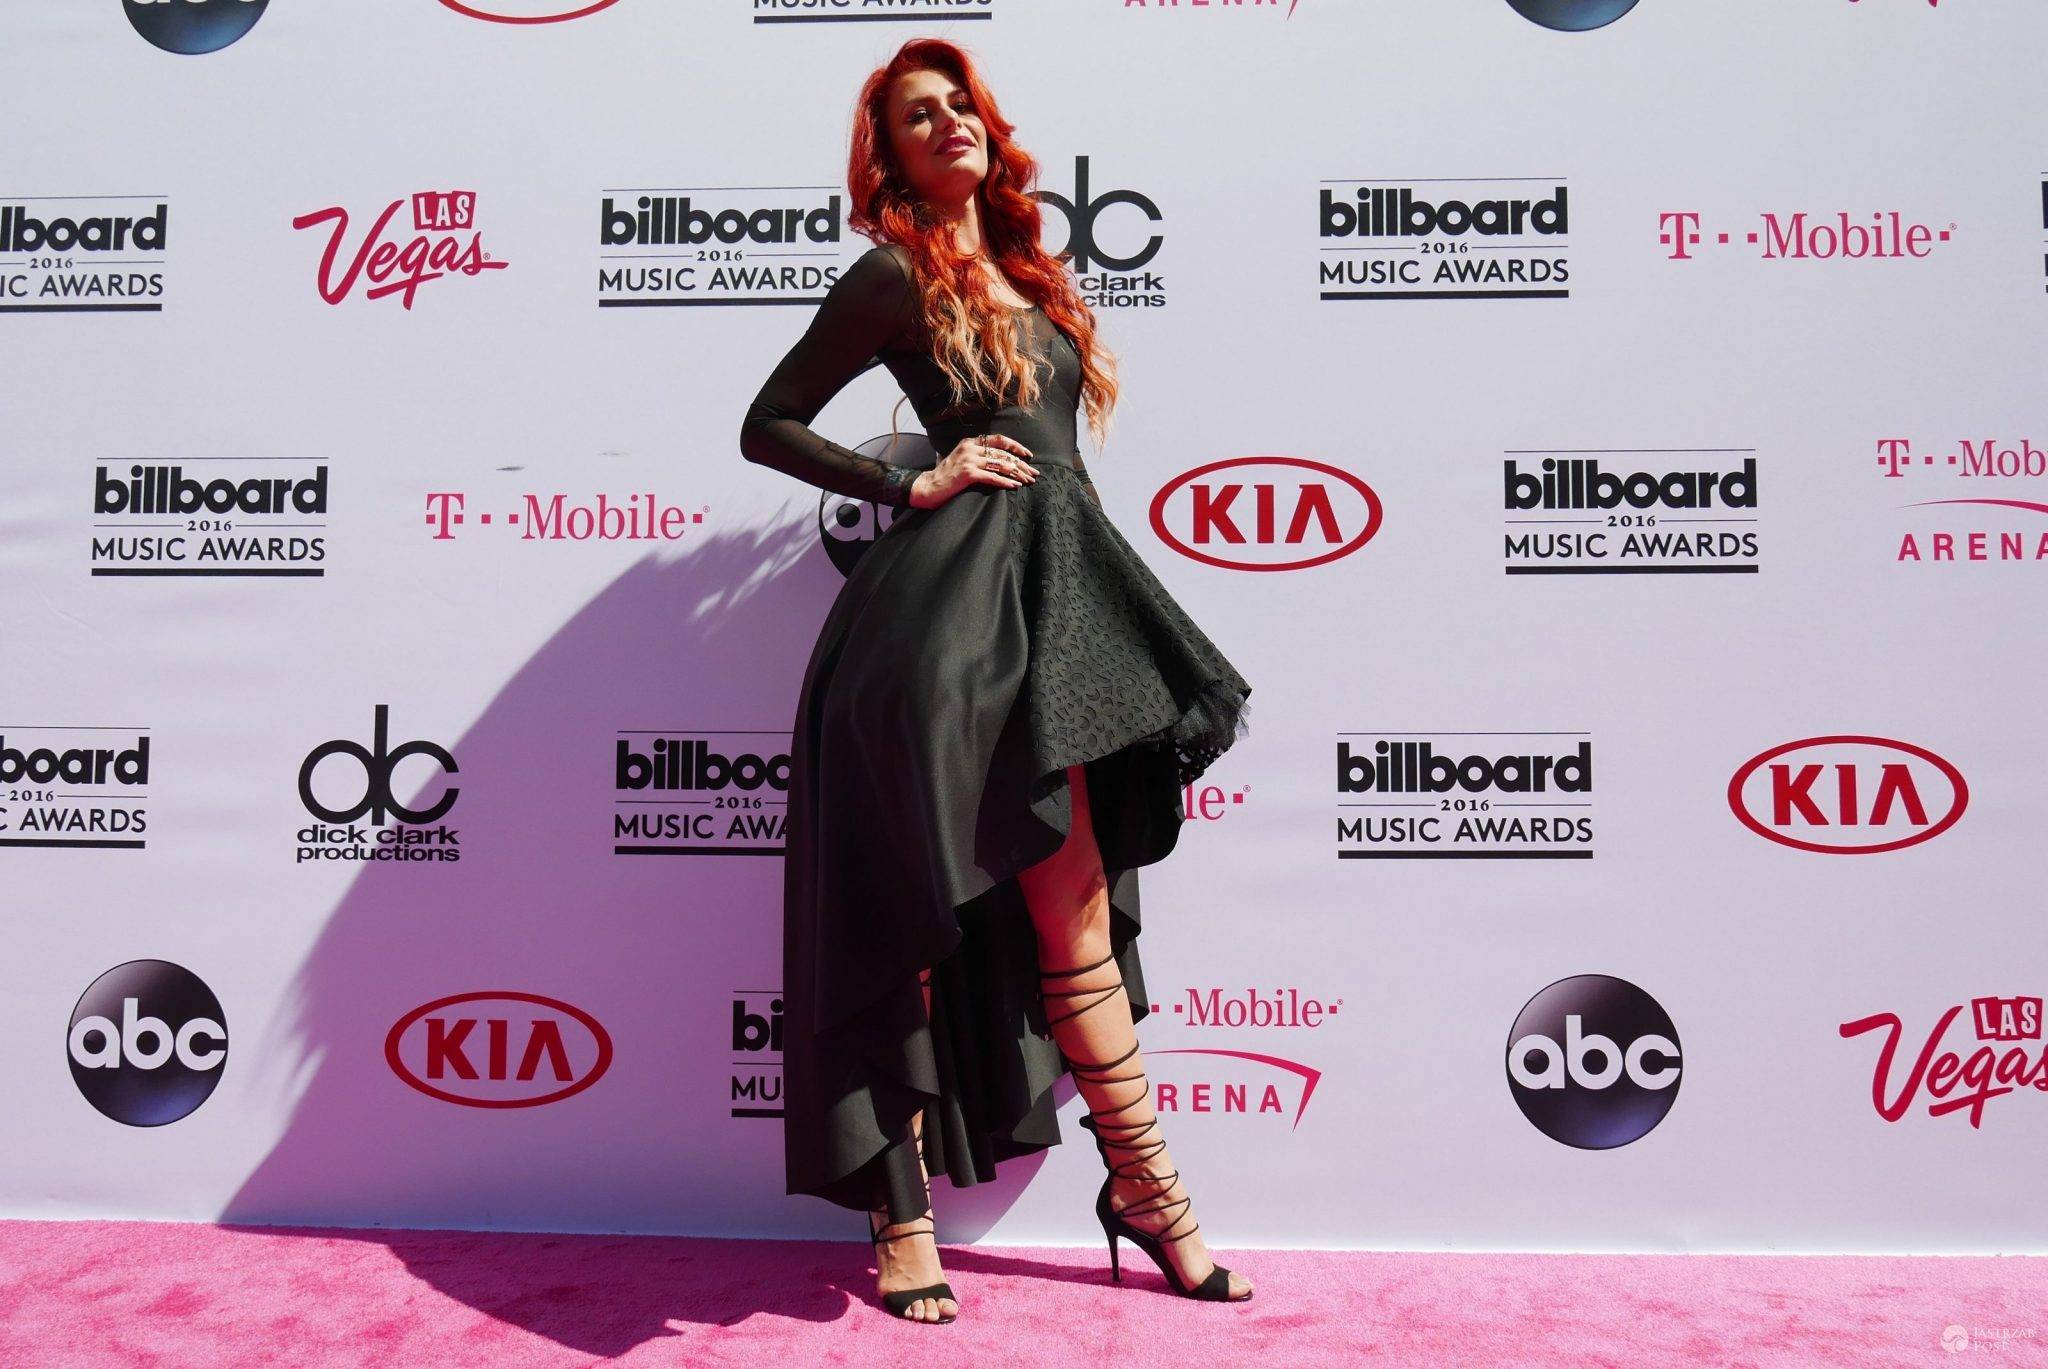 Suknia: Eva Minge, buty i torebka: Kazar. Aleksandra Gintrowska, Billboard Music Awards 2016 (fot. Jastrząb Post Exclusive)